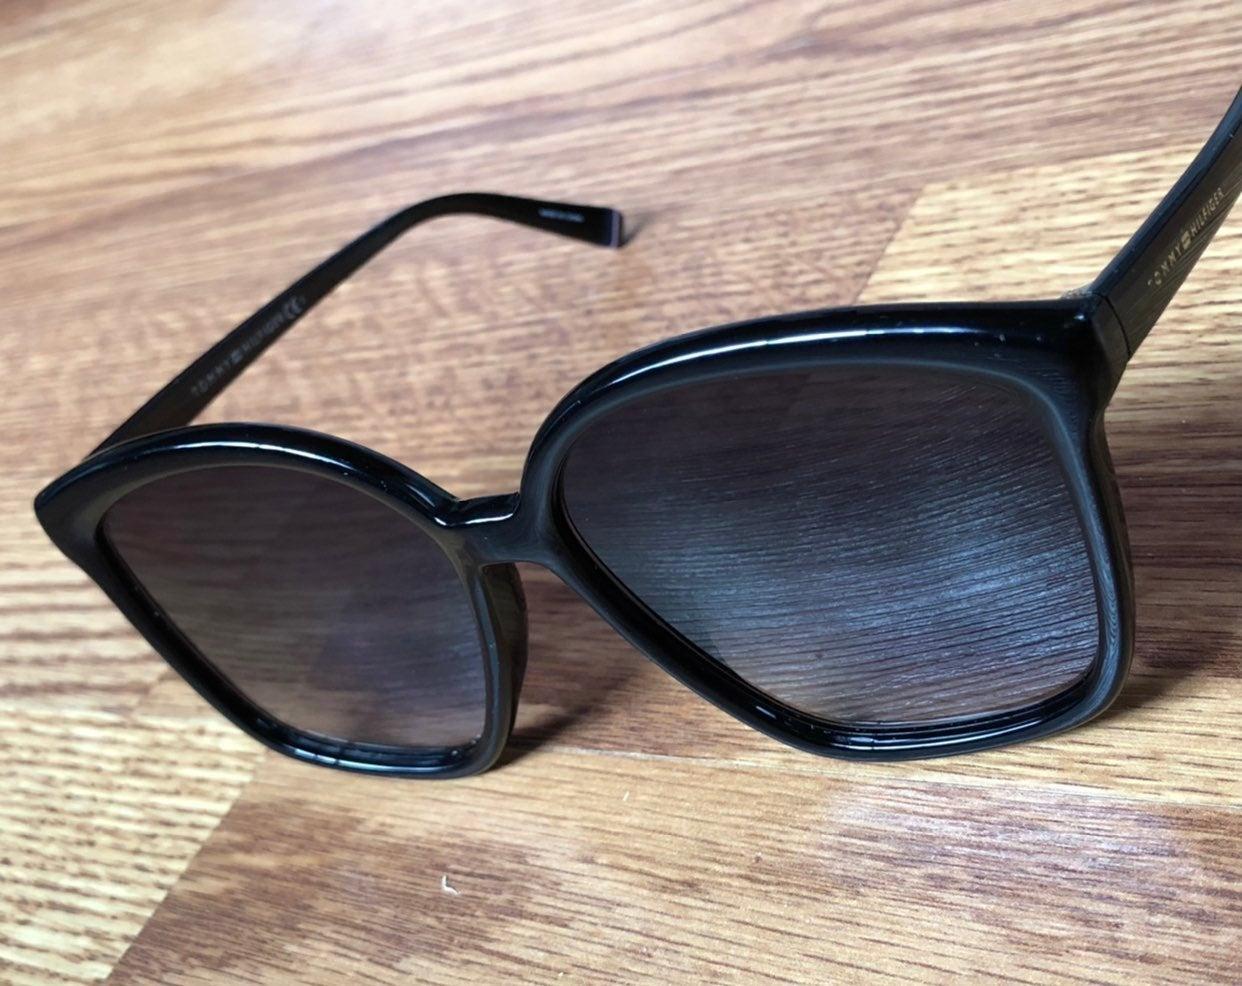 Tommy Hilfiger sun glasses